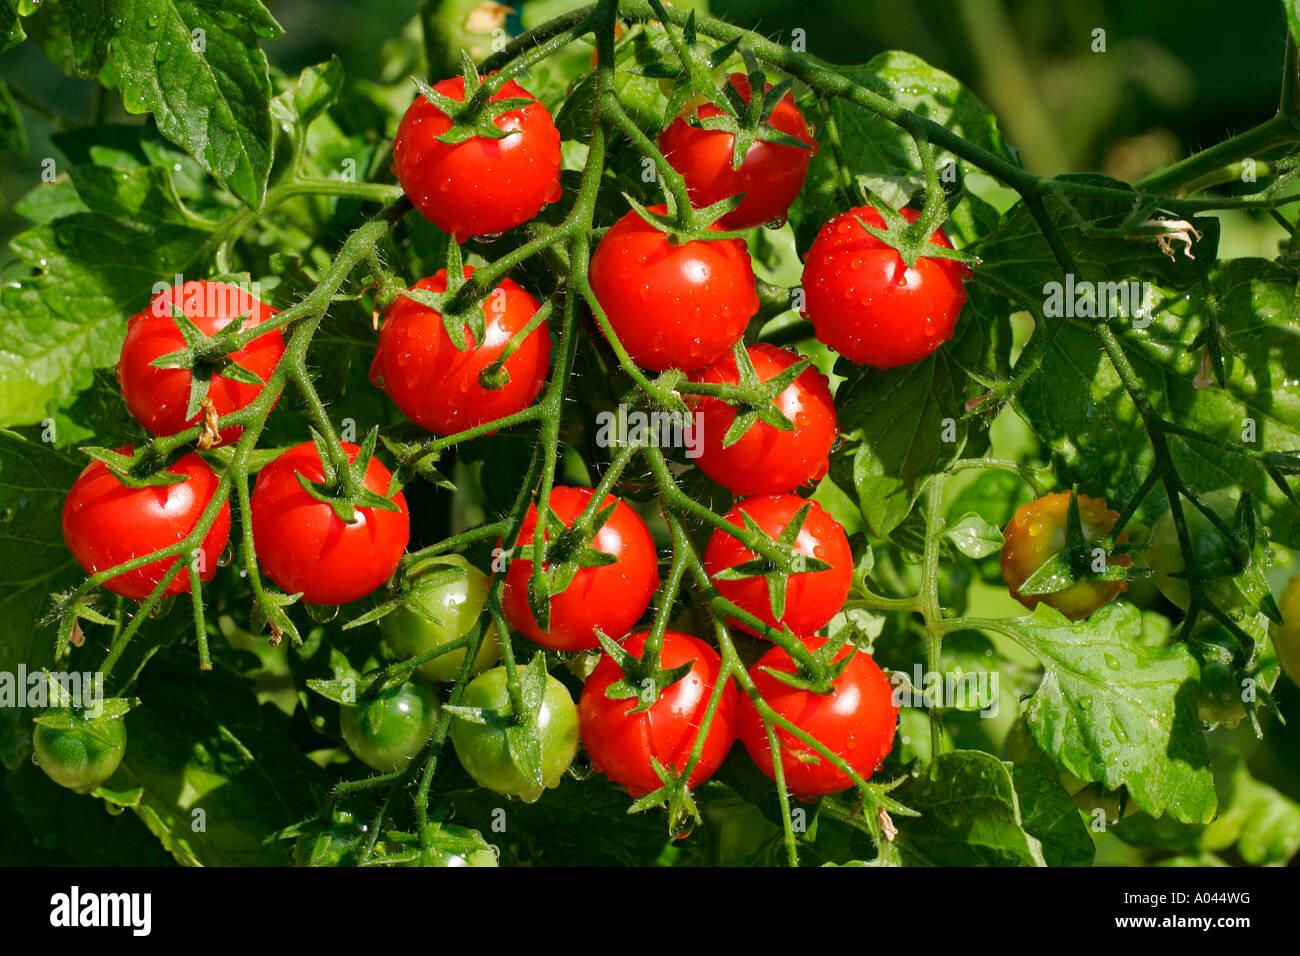 Tomatoes Tomato Dolce Vita (Lycopersicon esculentum var. esculentum) (Solanum lycopersicum) - Stock Image